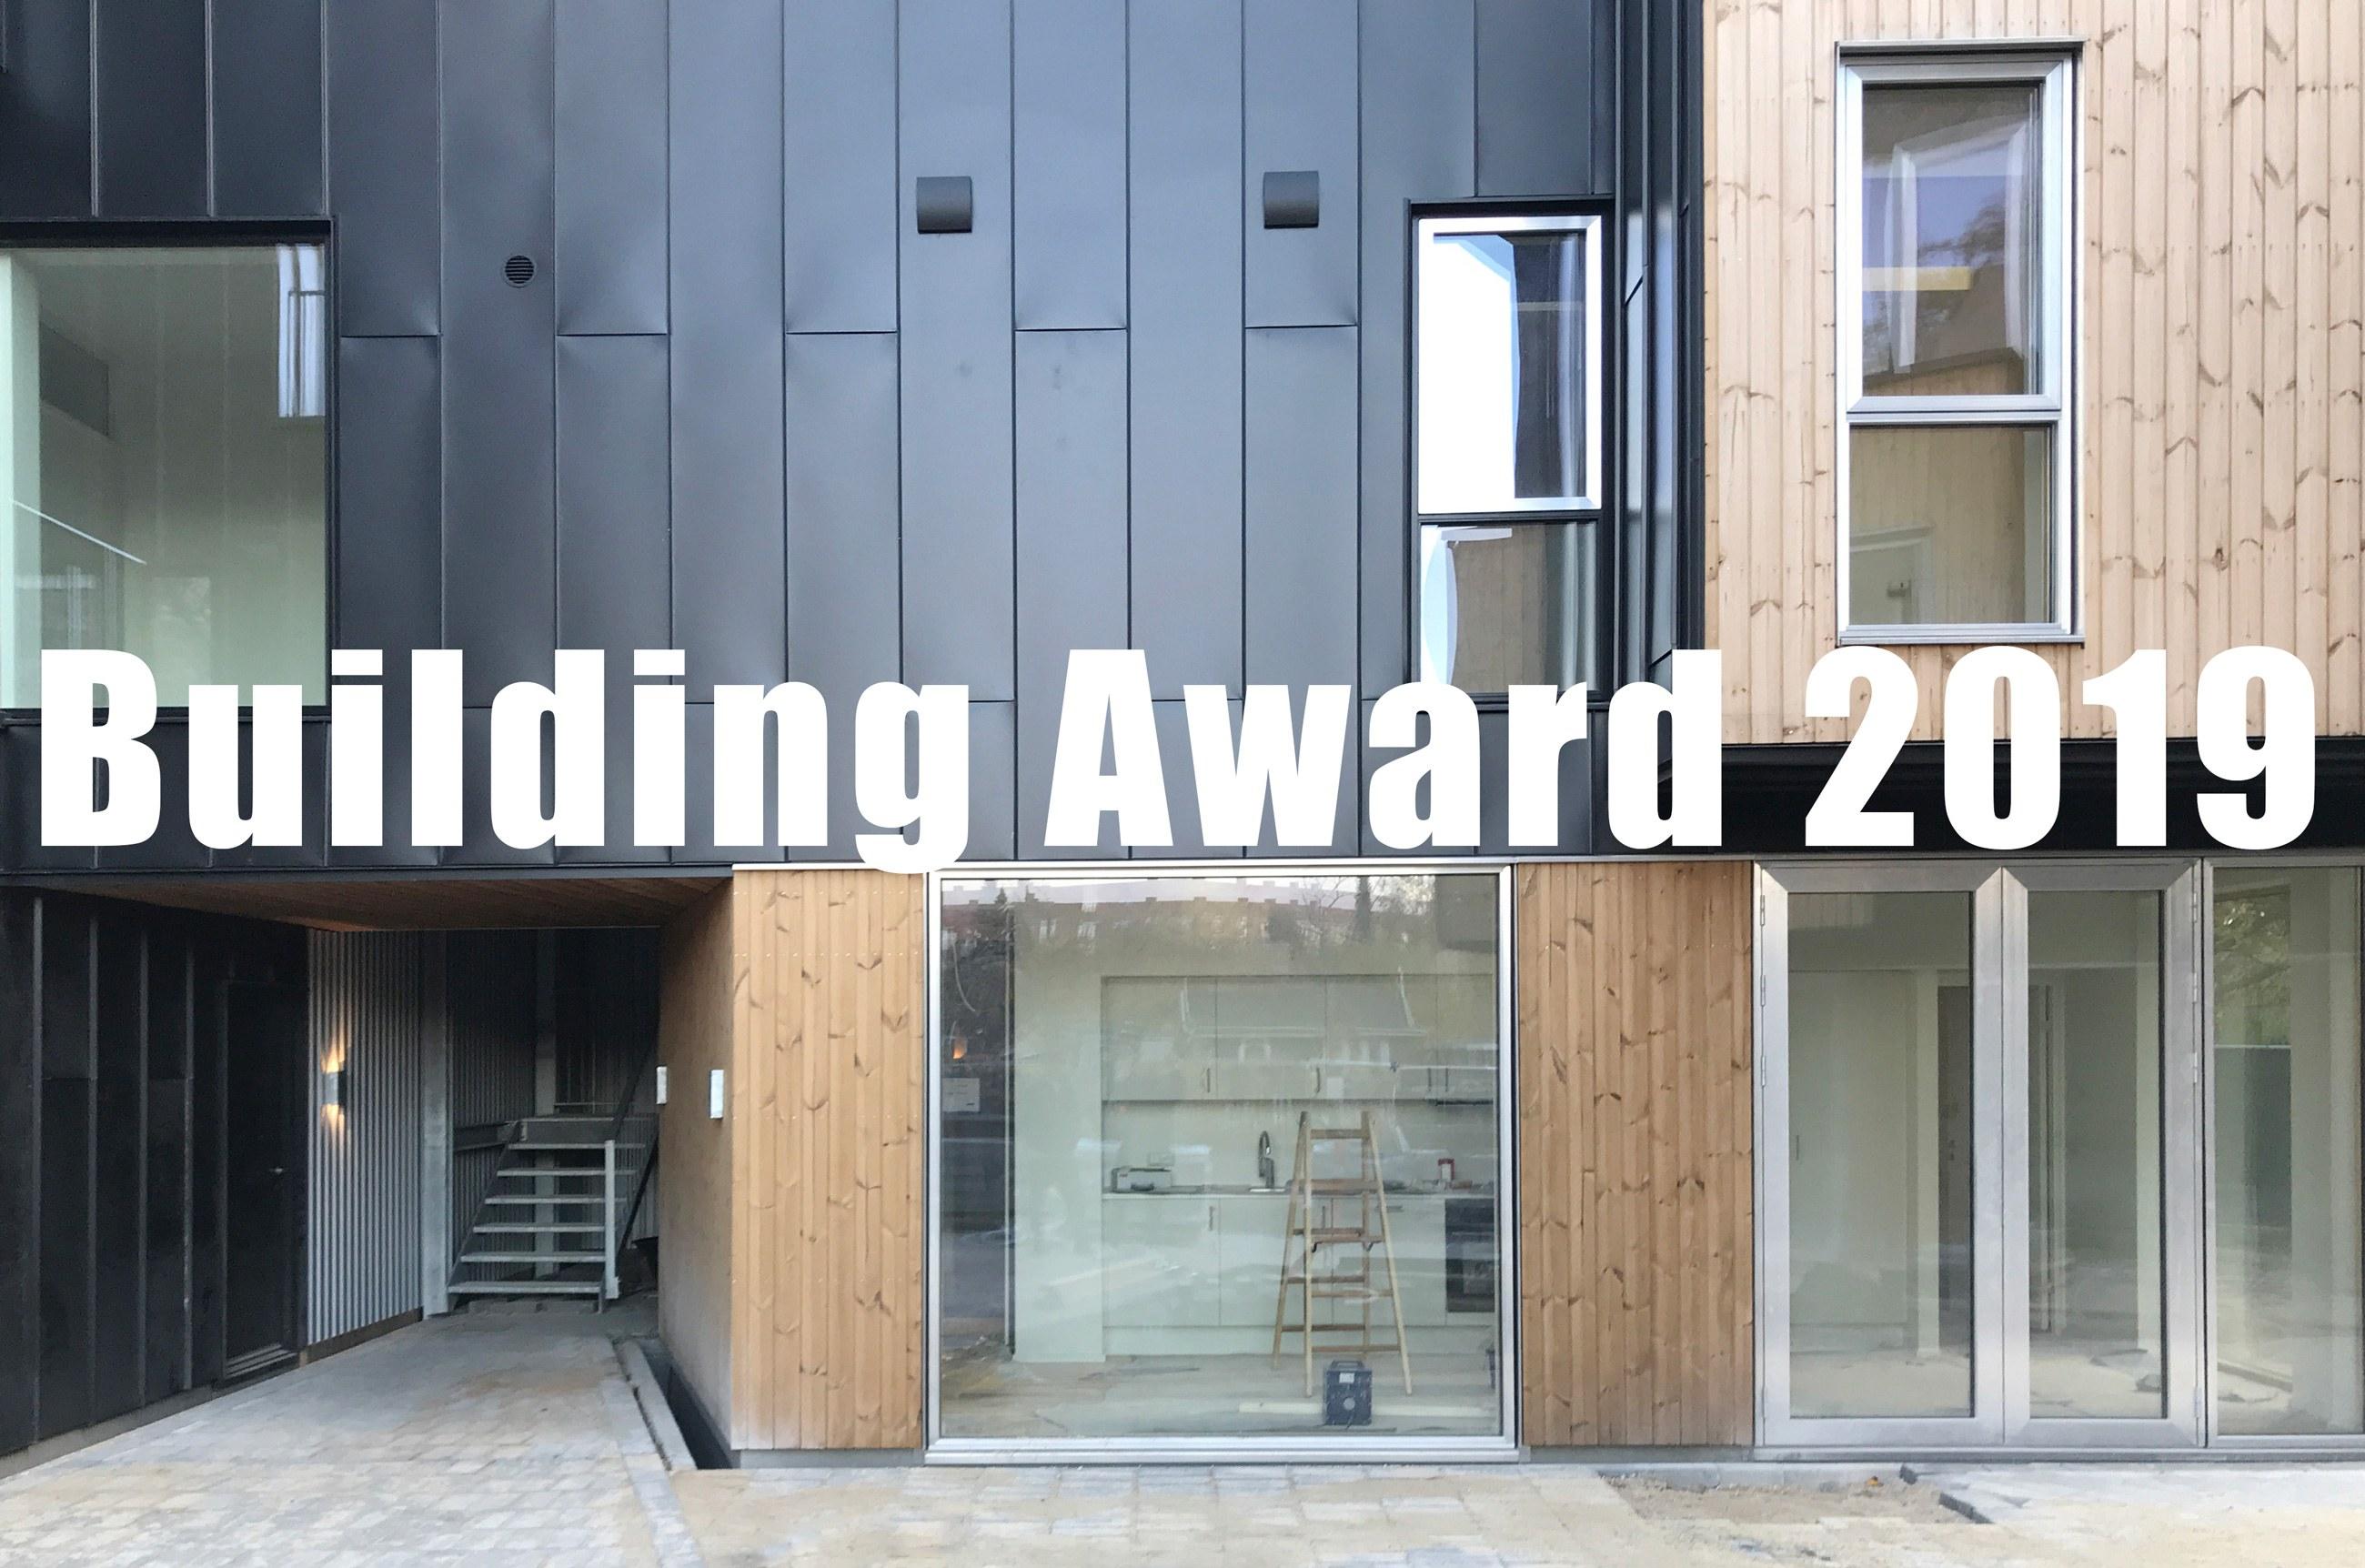 BA19-building-awards-2019-Venligbolig-Plus-ONV-arkitekter-præfab-boliger-prefab-housing-1